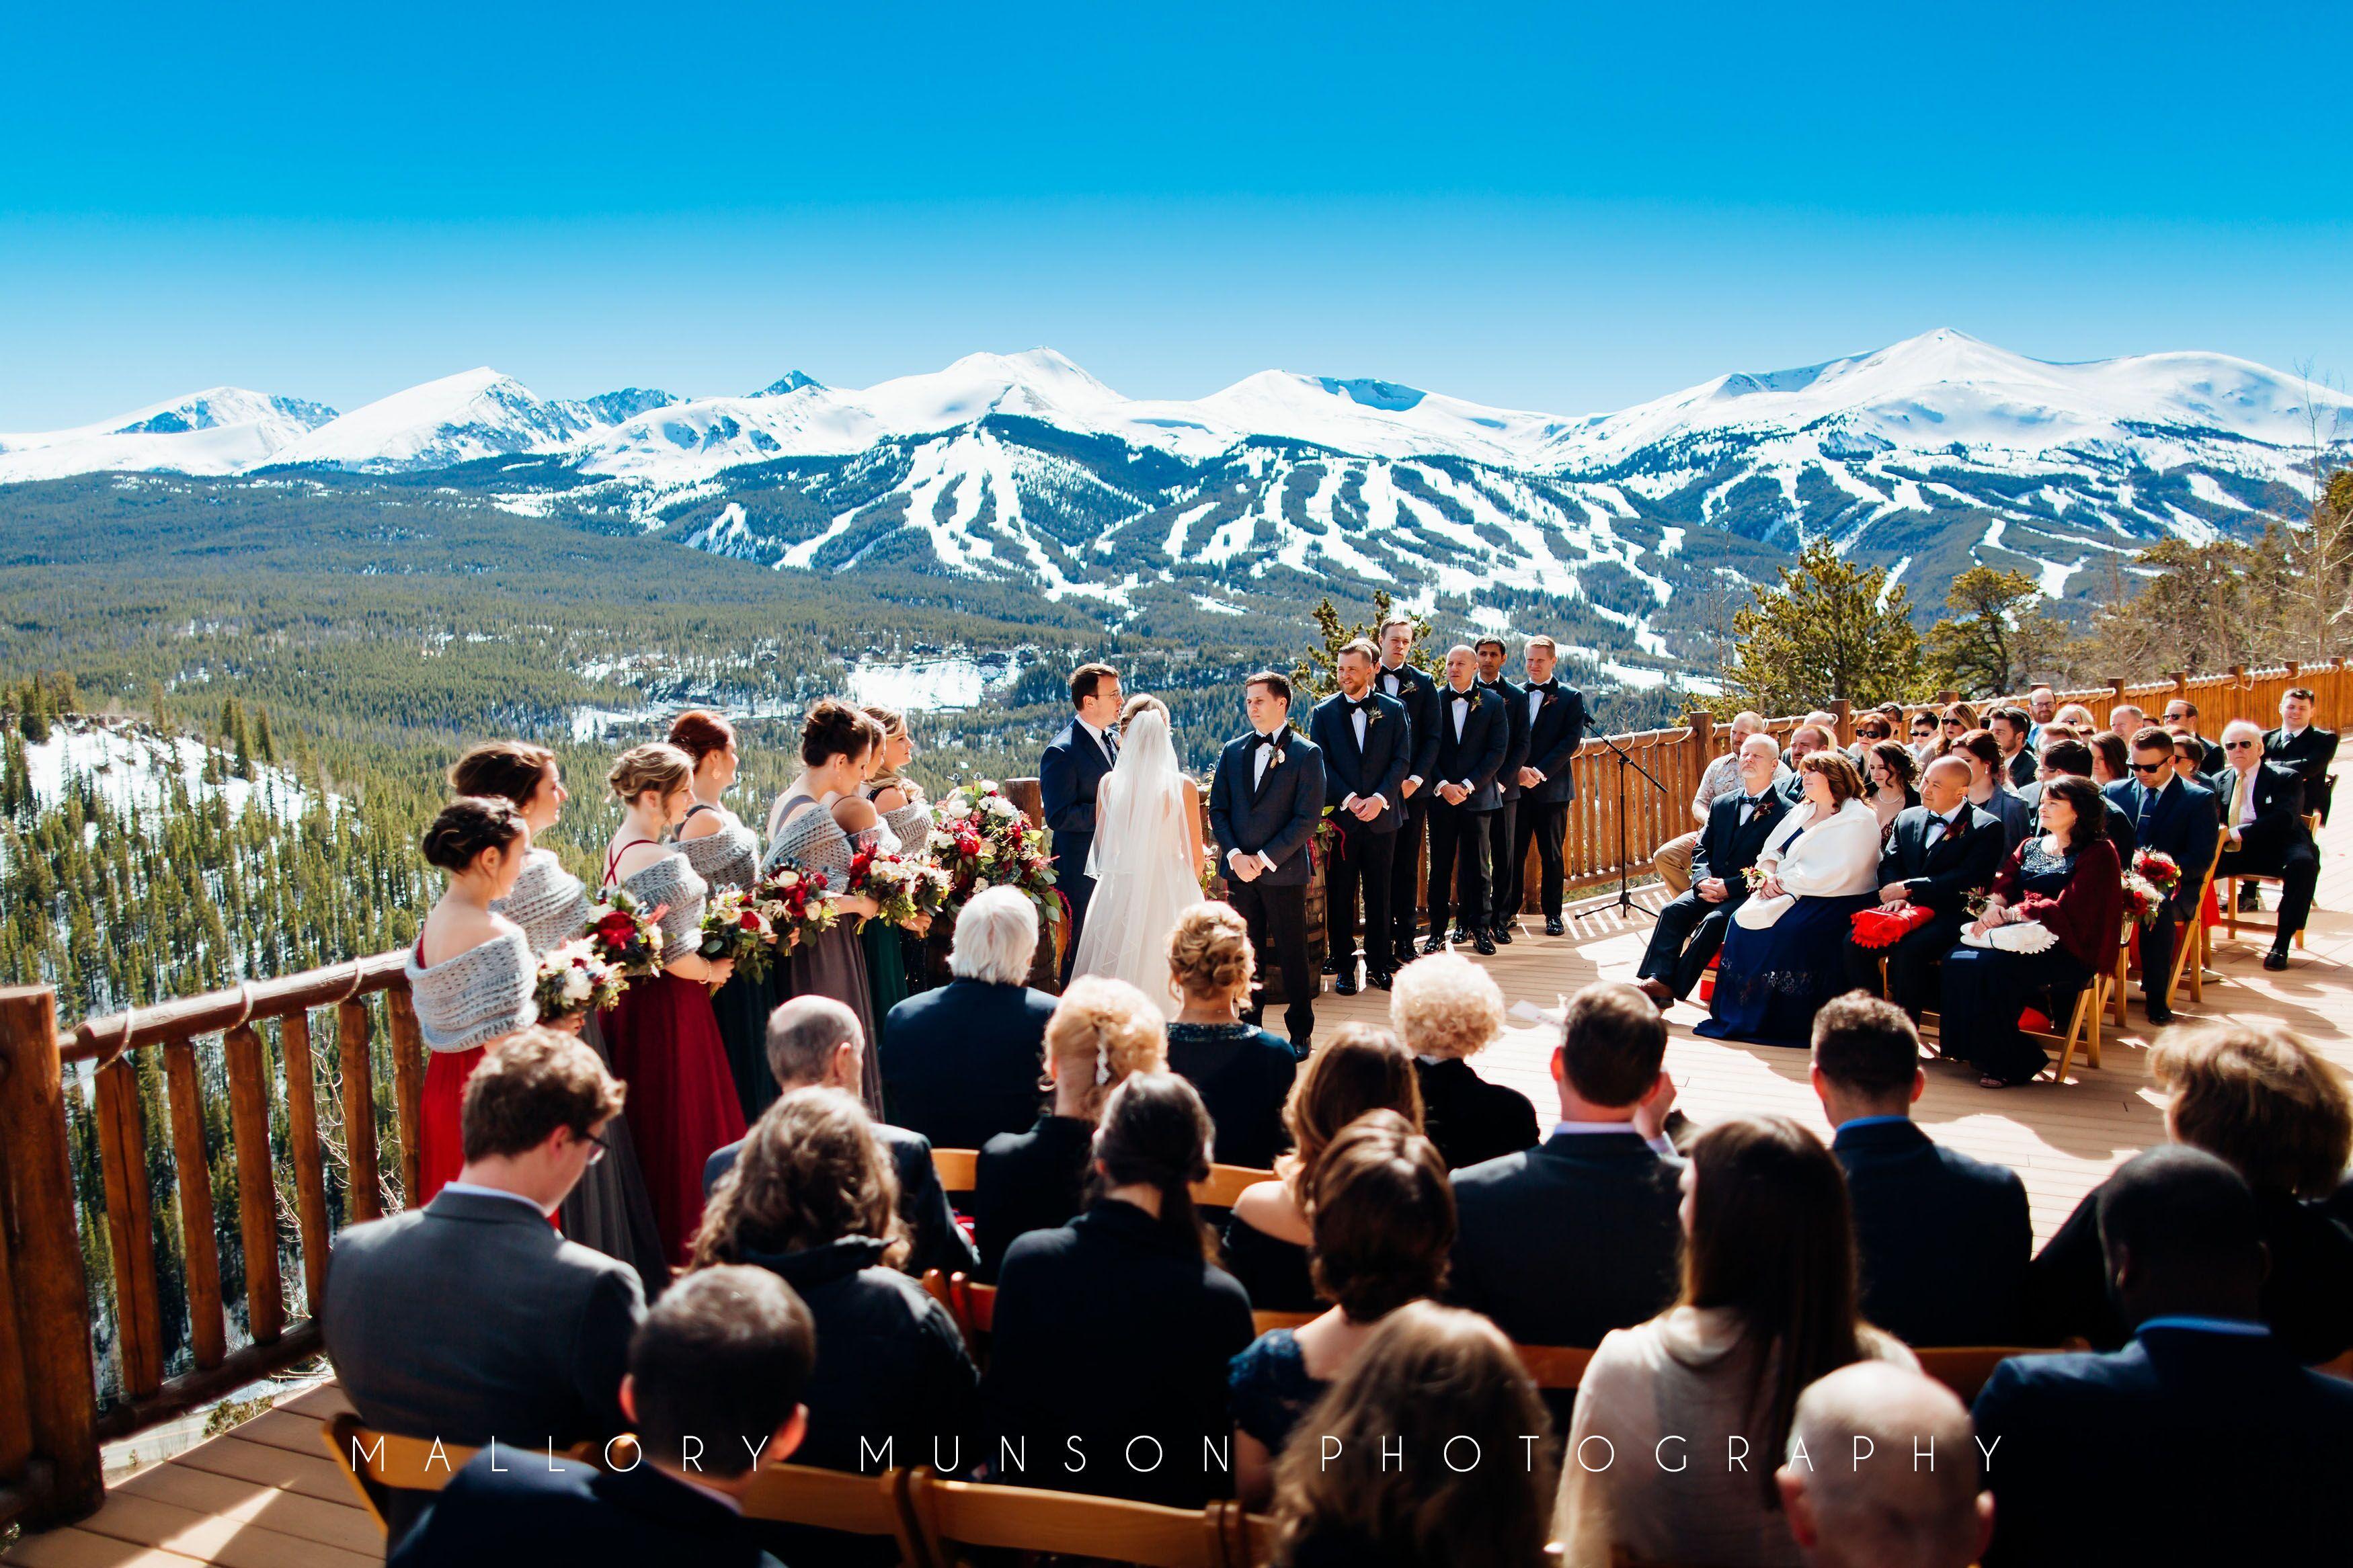 The Lodge At Breckenridge In 2020 Colorado Wedding Venues Colorado Wedding Winter Wedding Venues